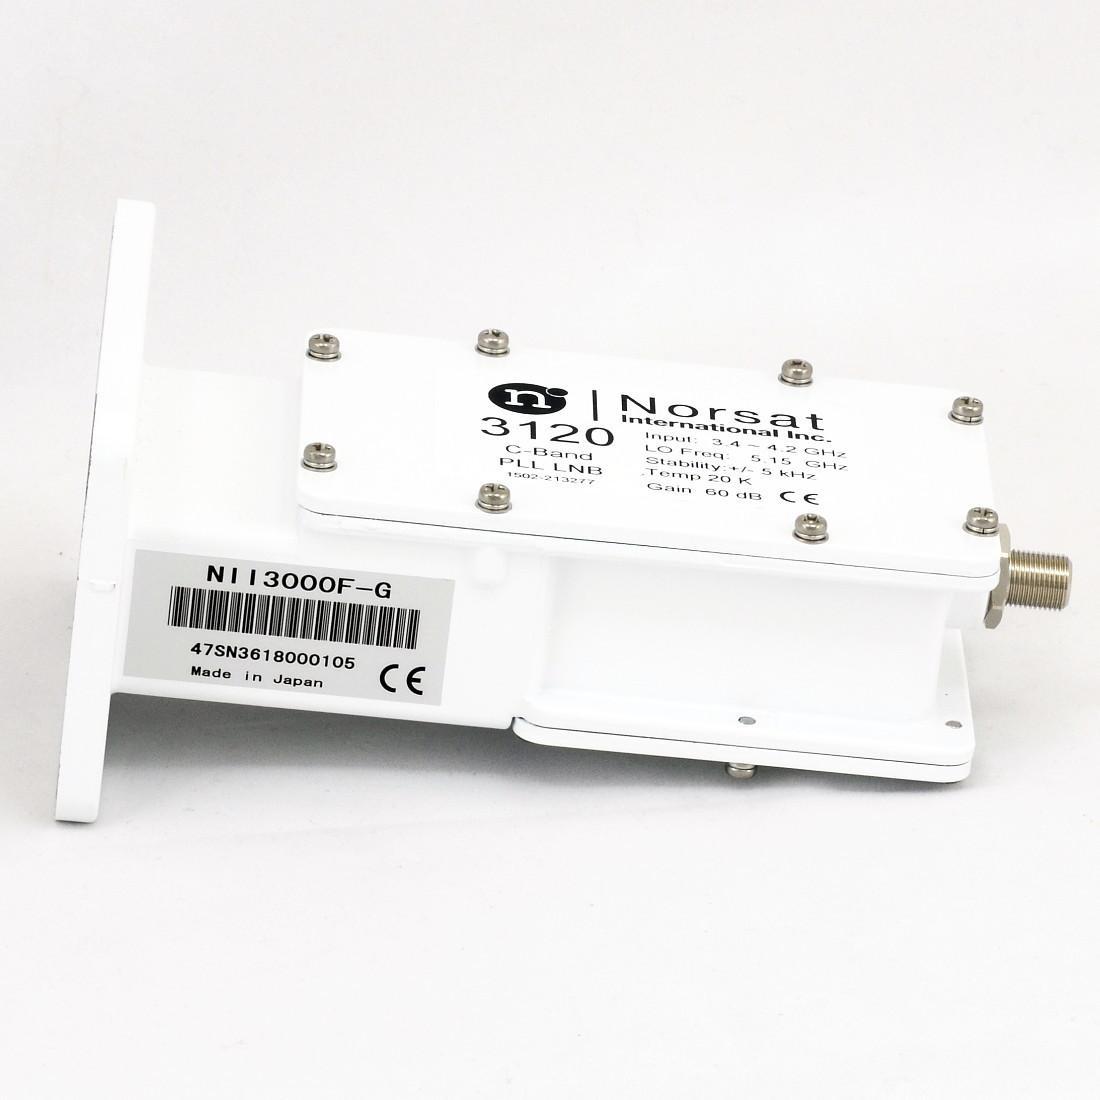 Norsat 3120 C-Band PLL LNB